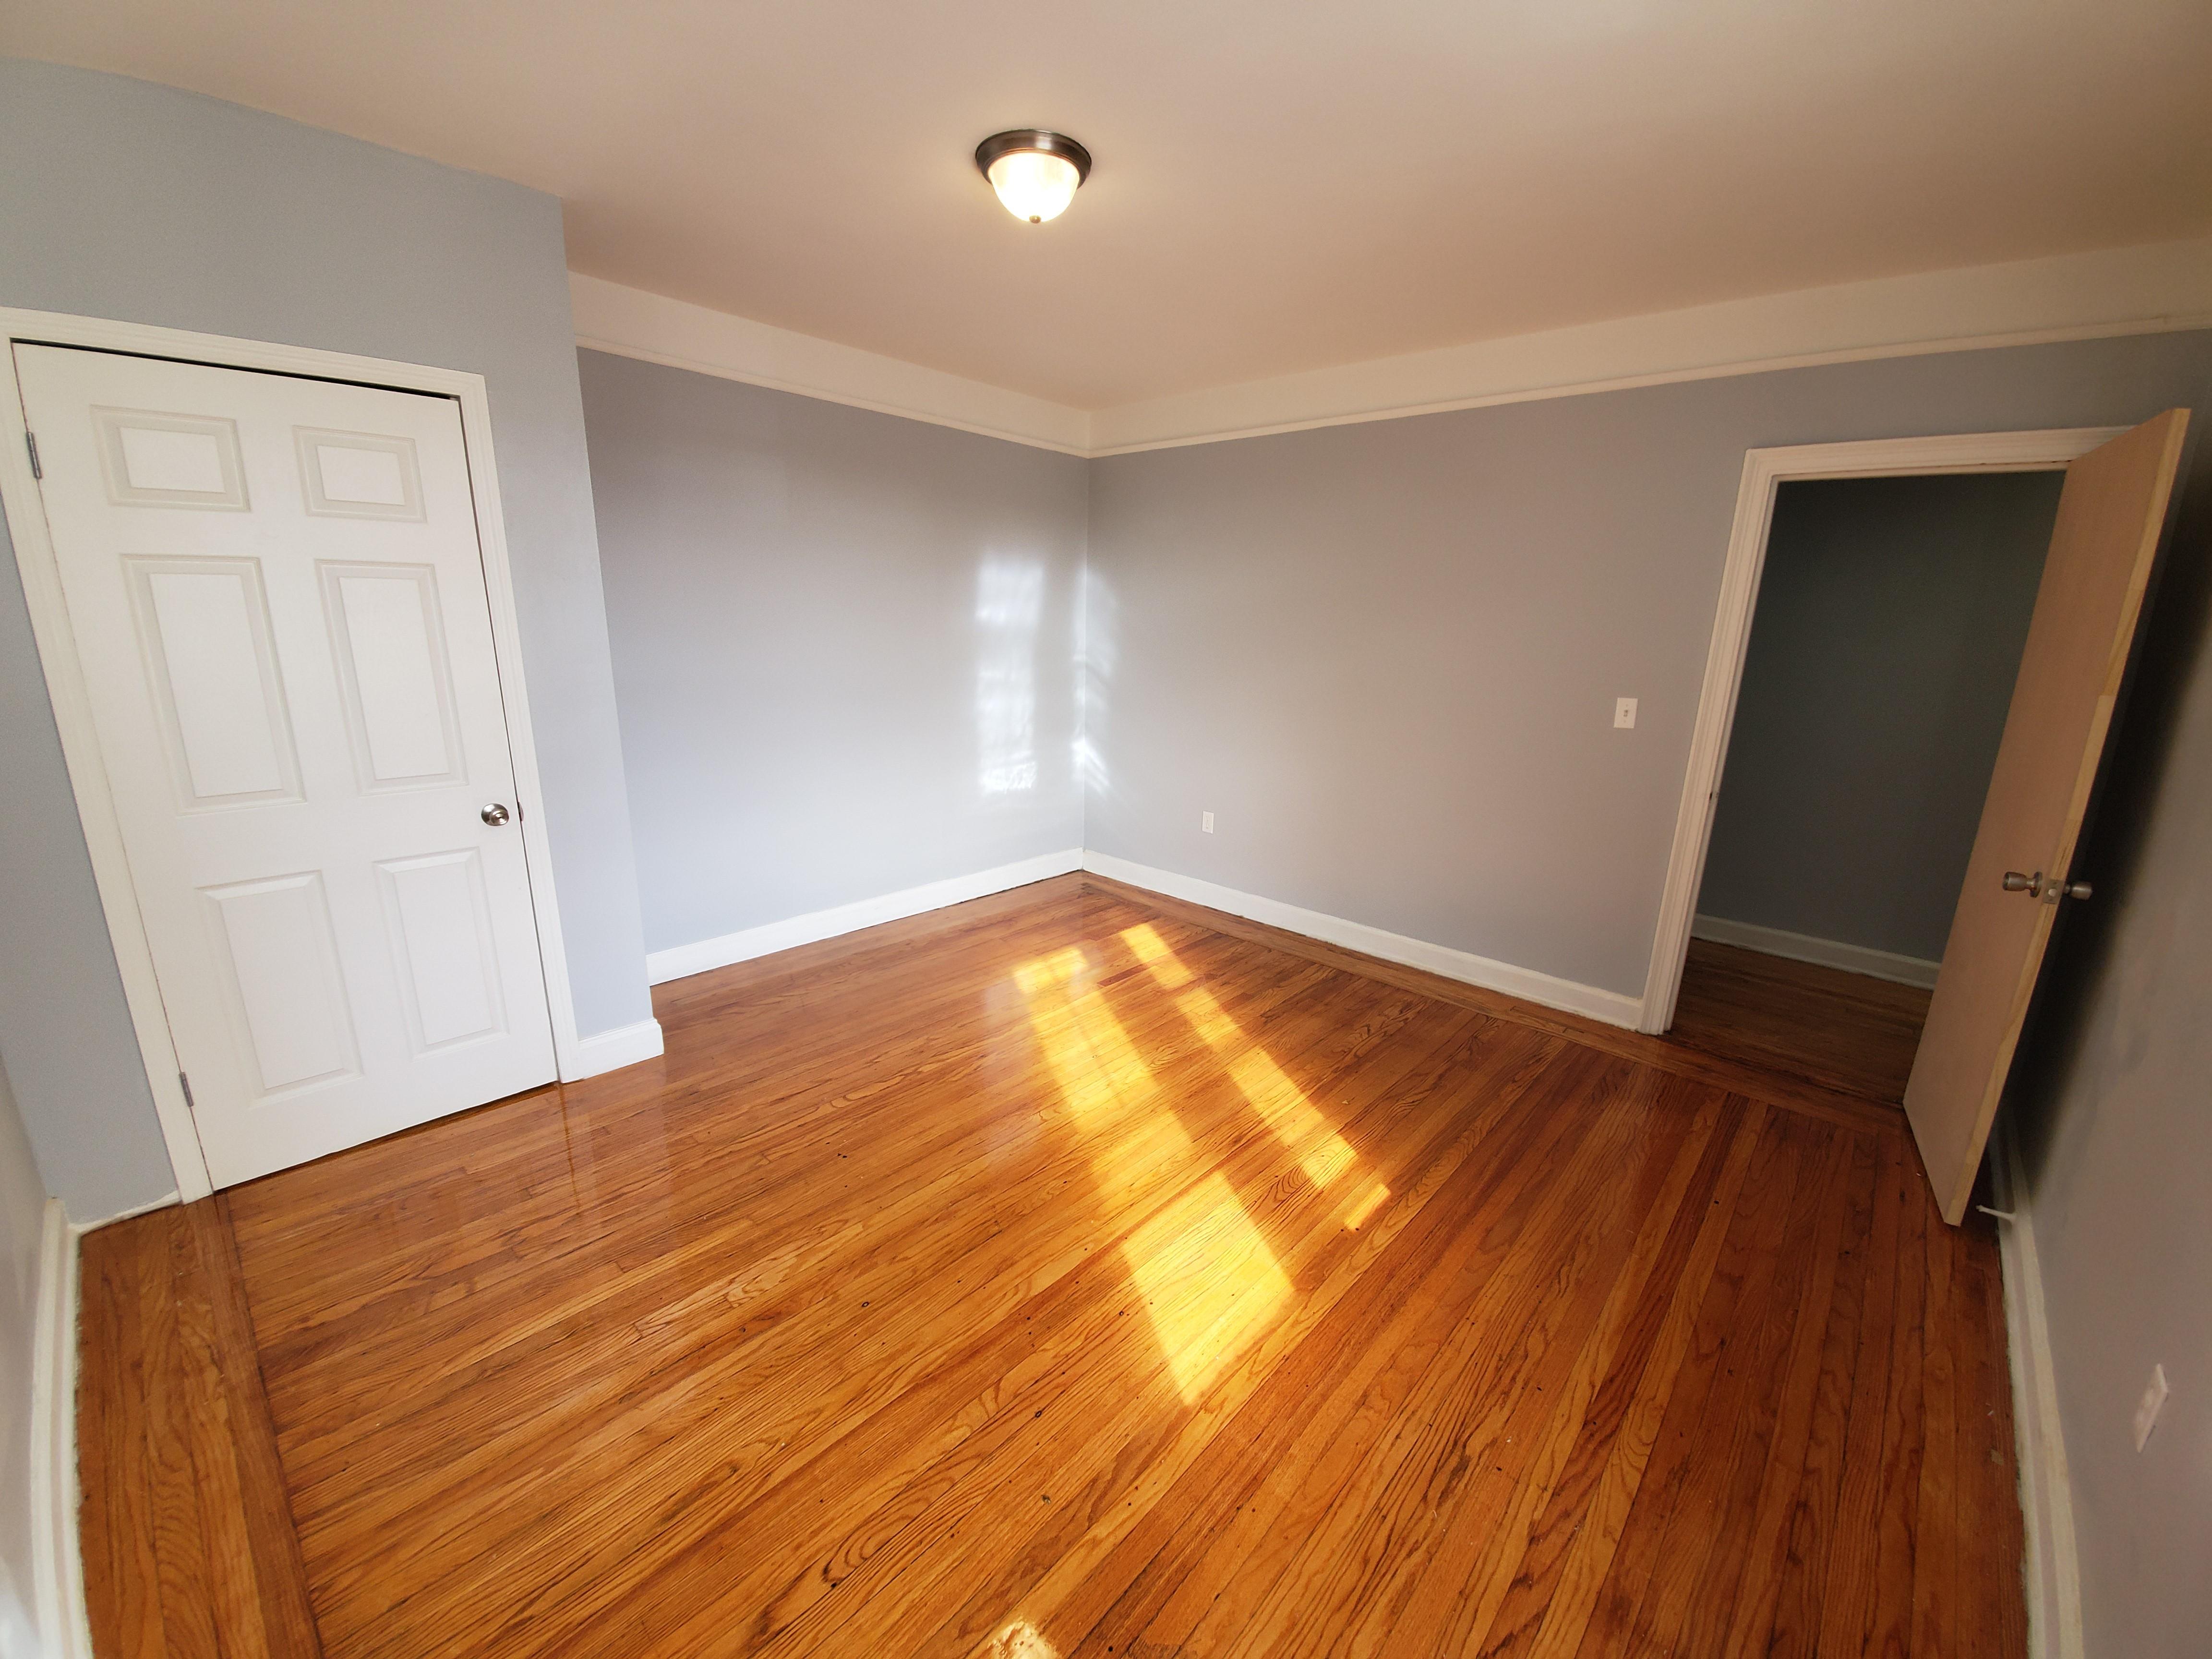 50 Anderson Street, Hackensack, NJ 07601 rental